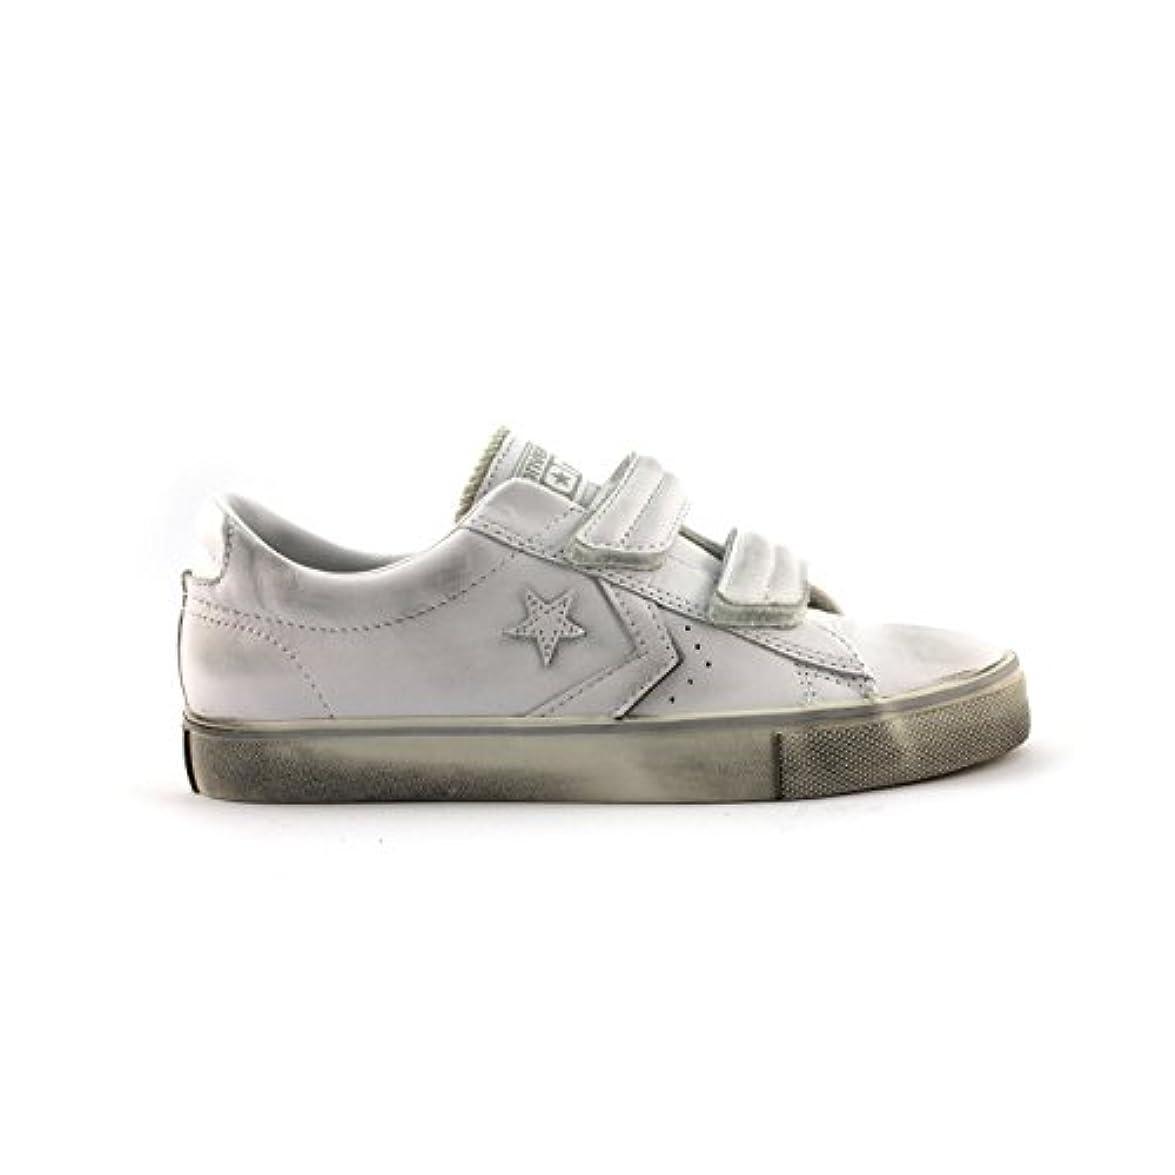 Converse Pro Leather Strap Ox 155240cs Sneaker Pelle Unisex White Monochrome